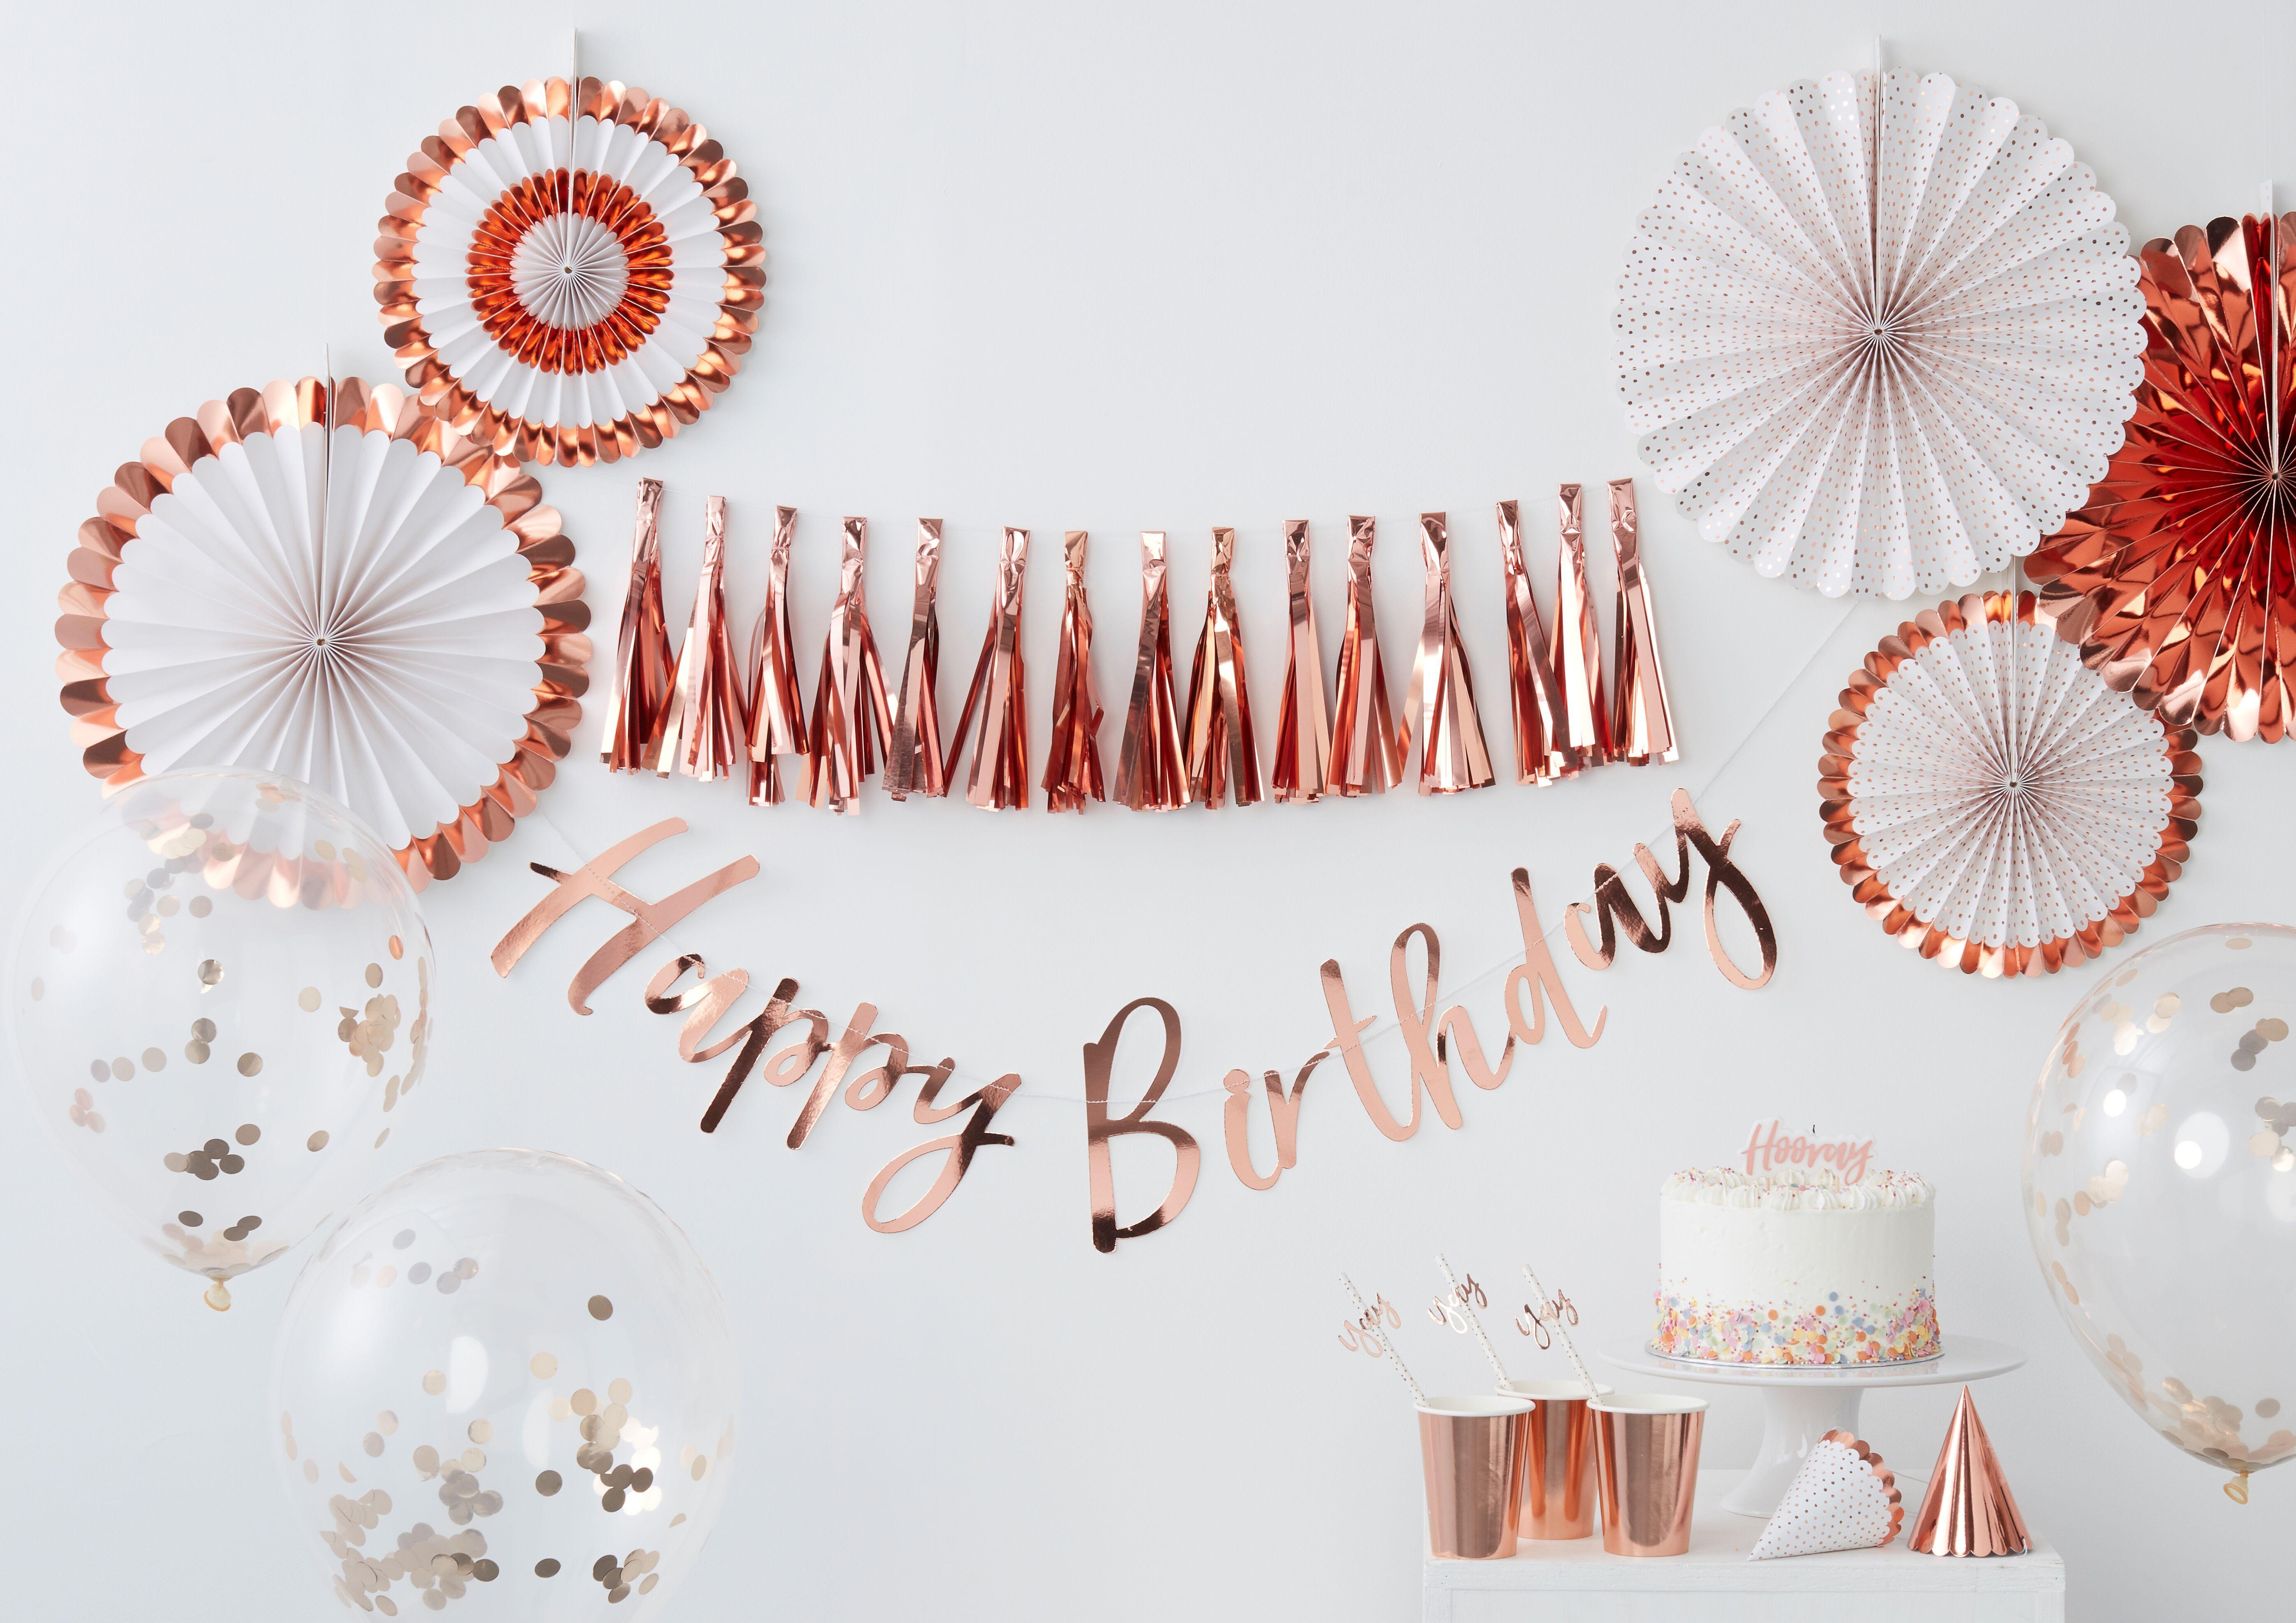 rose gold party | Decoracion fiesta cumpleaños, Decoración fiesta adultos, Decoración de fiesta